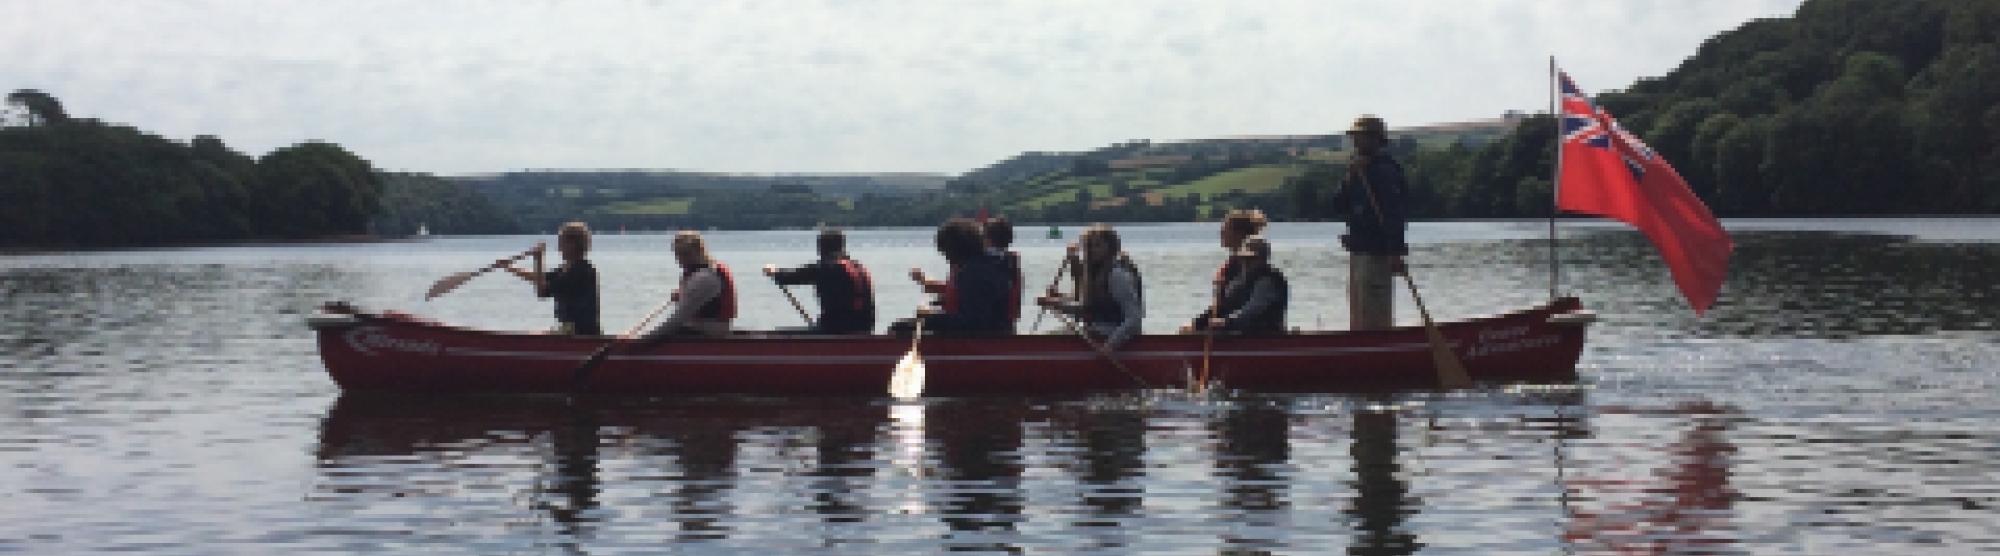 family canoeing with Canoe Adventures